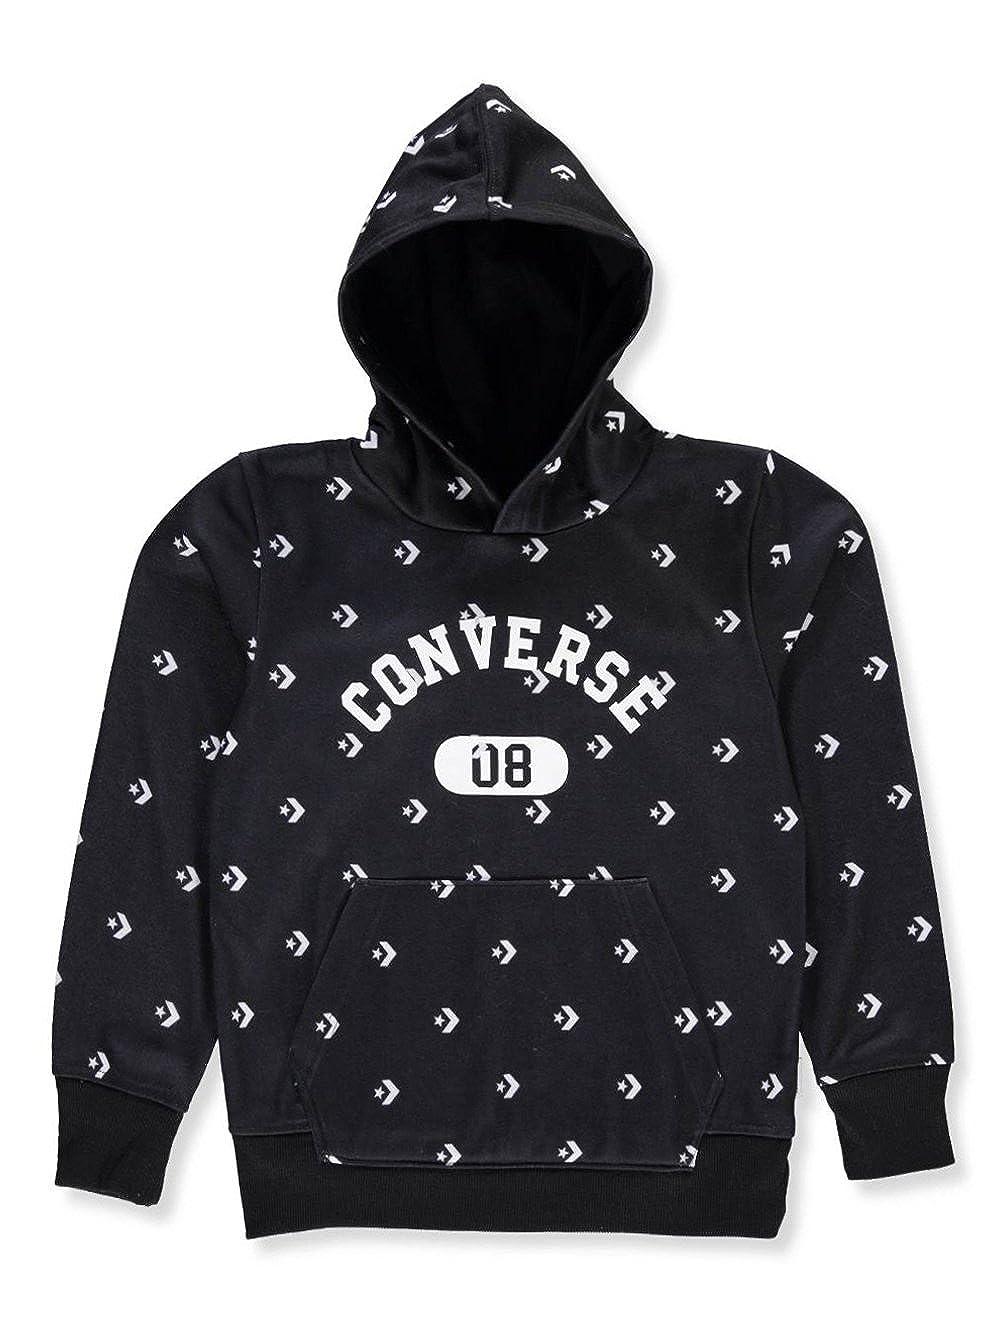 1b1455f89393c5 Amazon.com  Converse Boys  Hoodie  Clothing